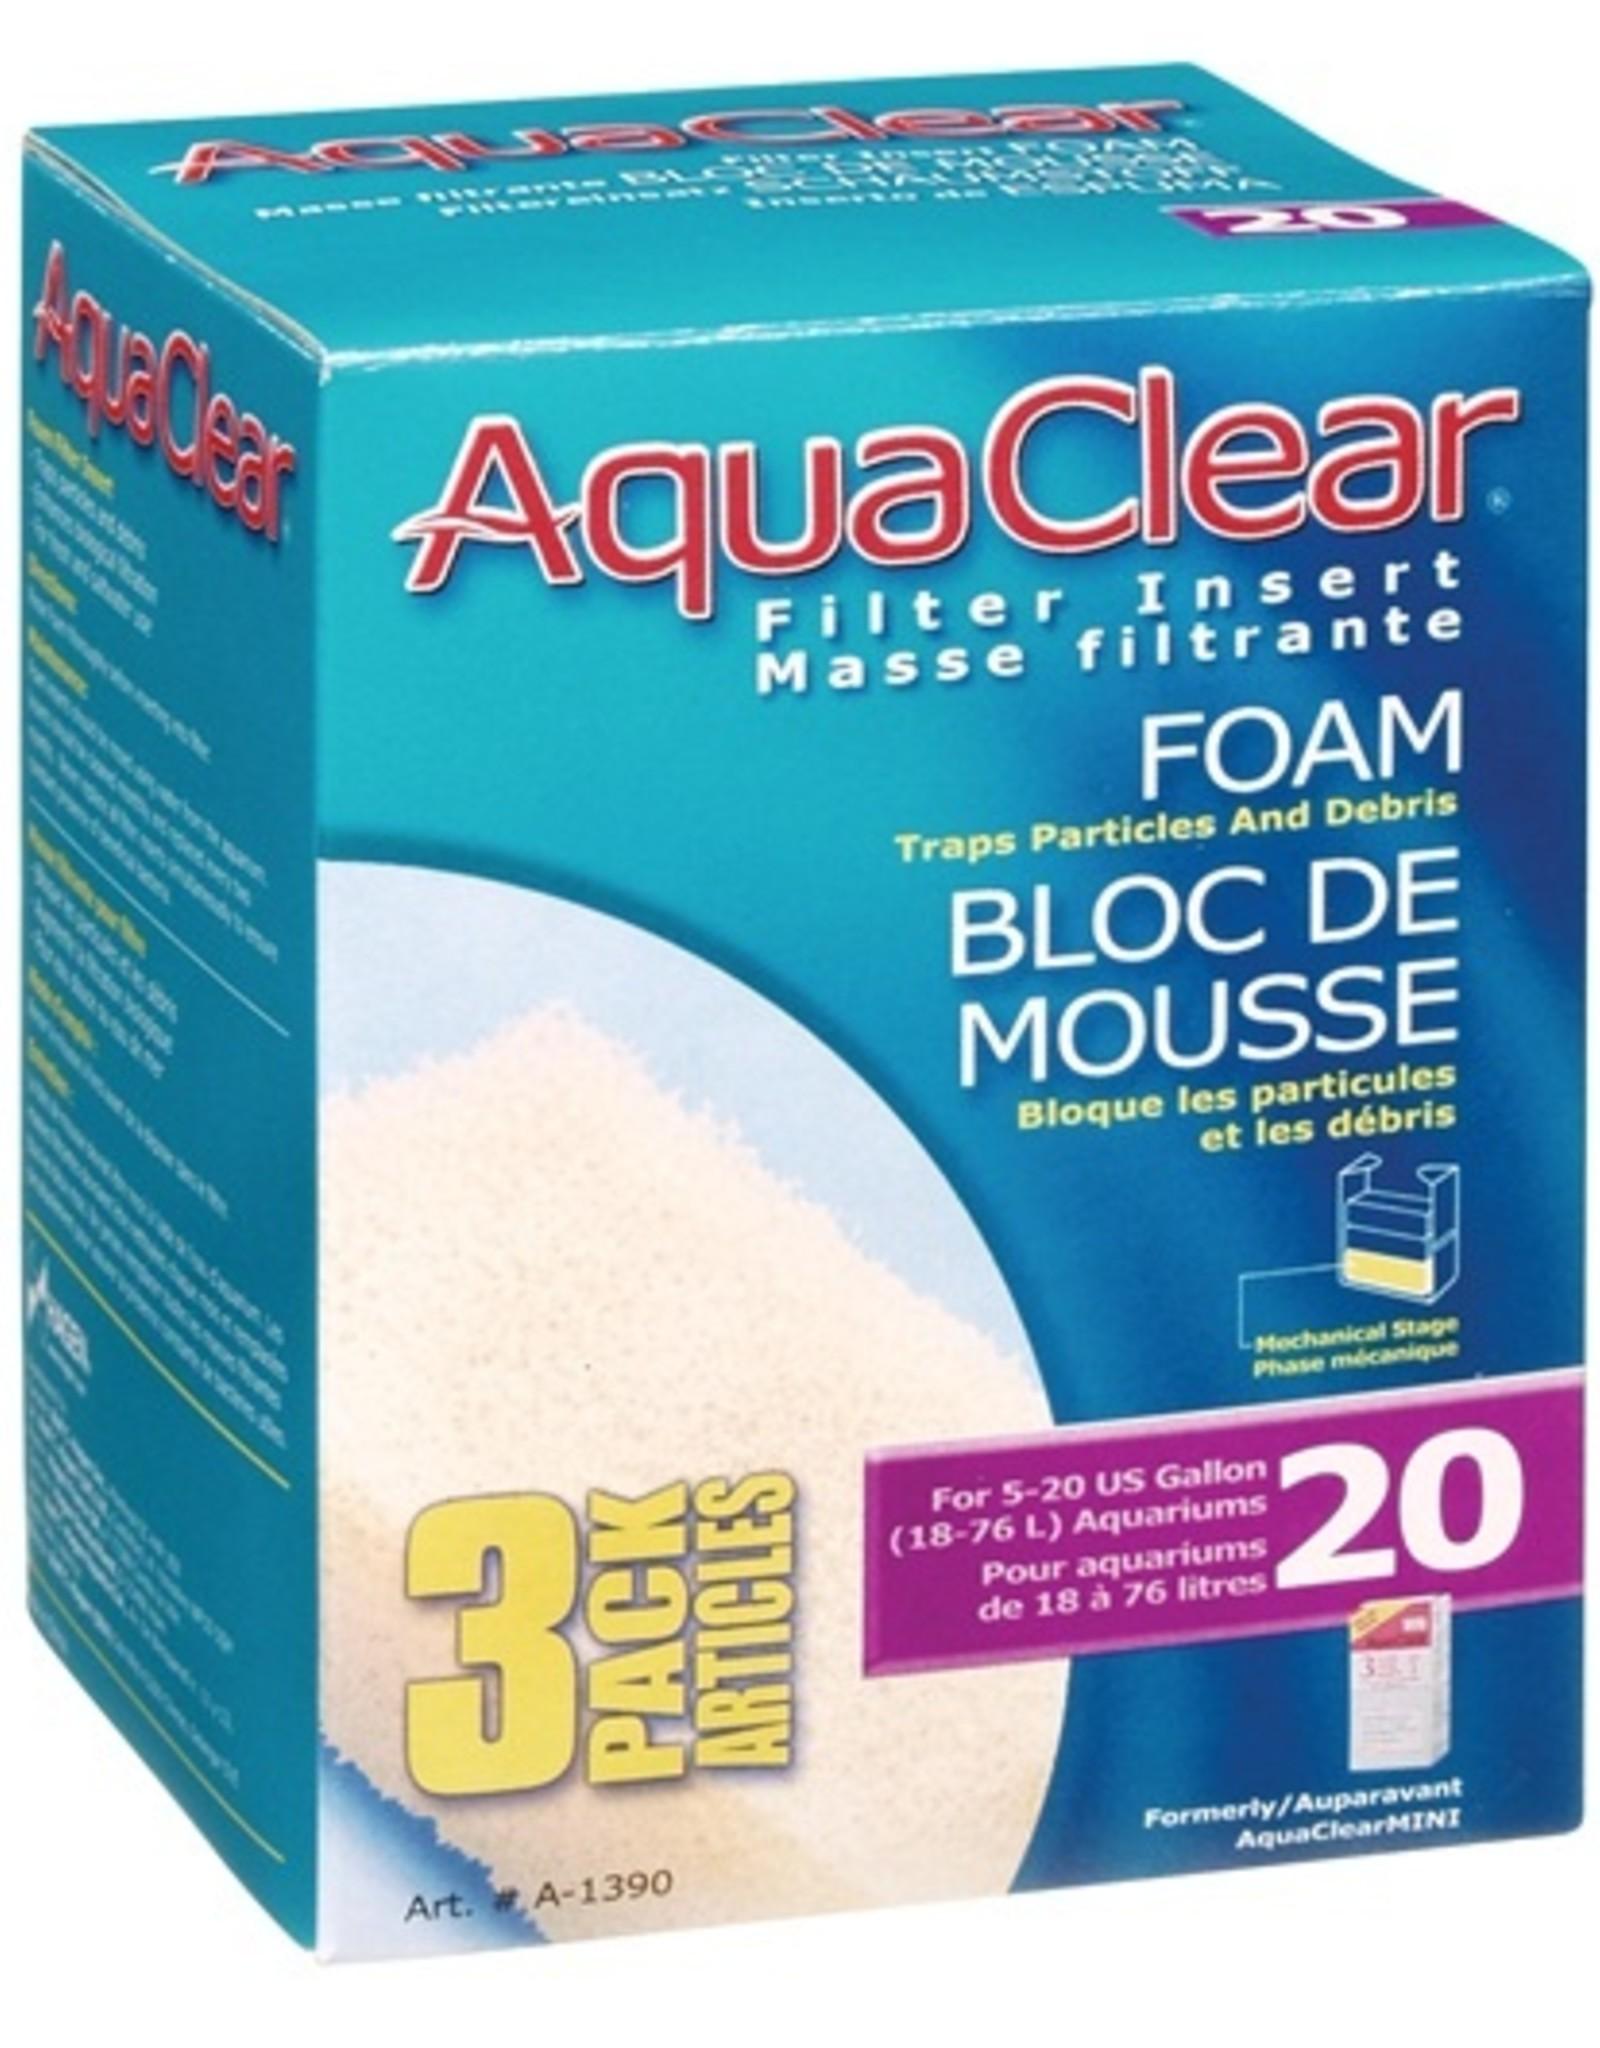 HAGEN AQUA CLEAR 20 (MINI) 3PK FOAM